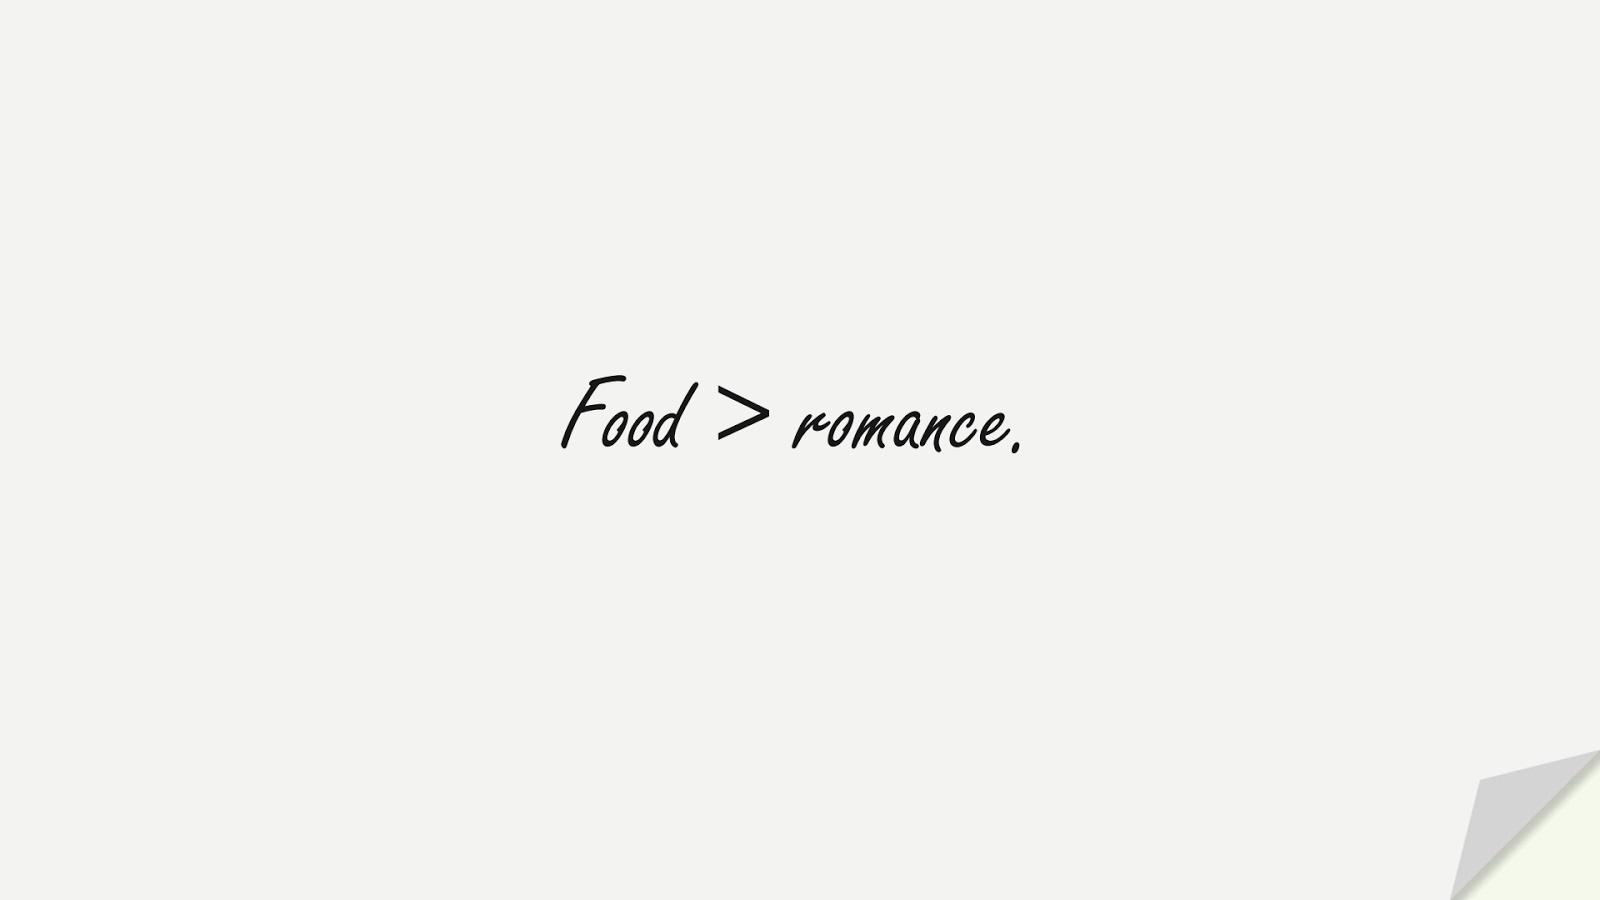 Food > romance.FALSE